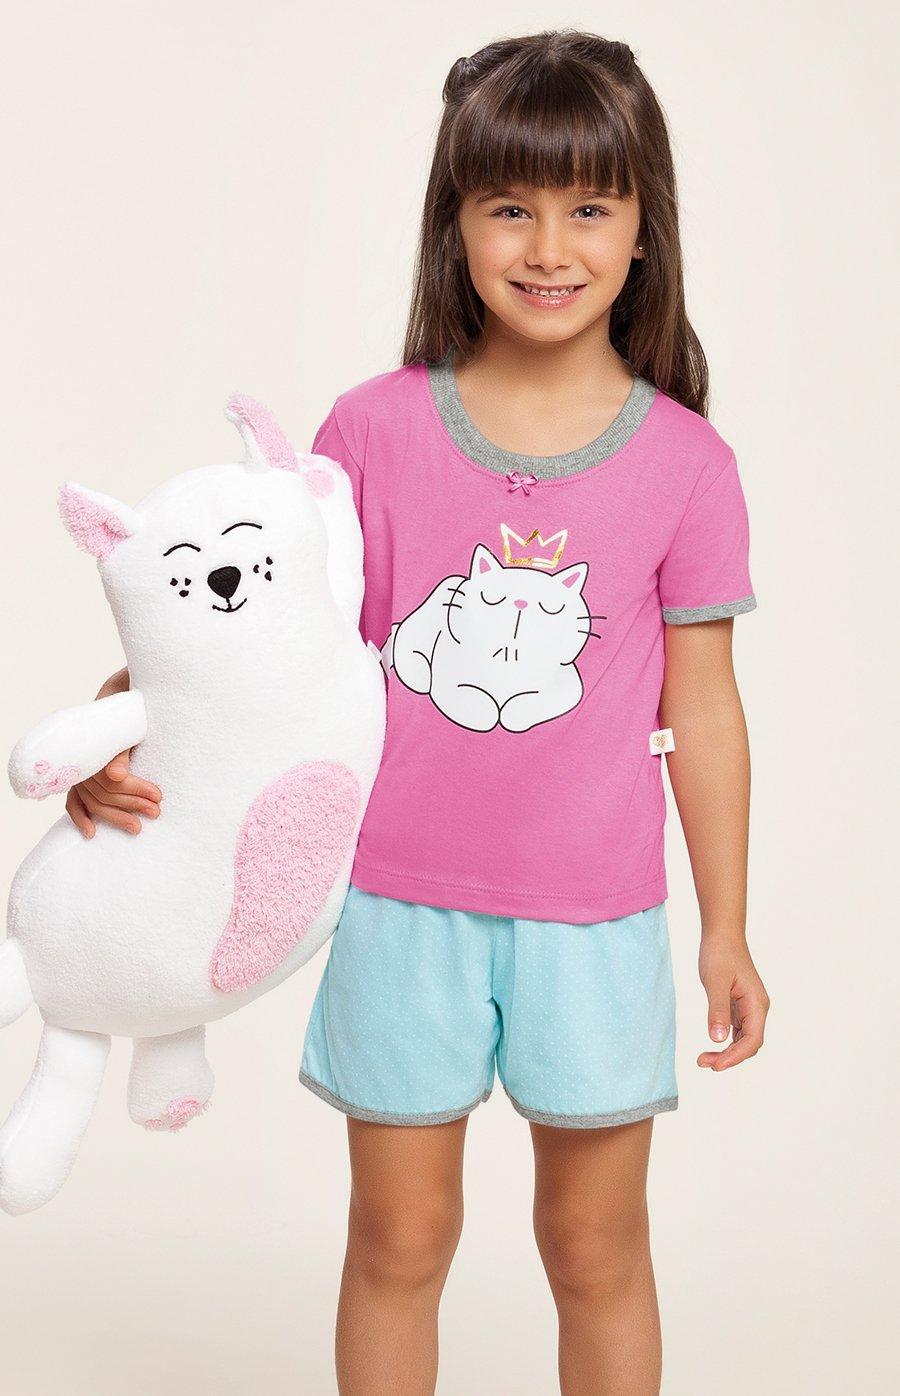 Pijama Baby 100% Algodão Meow Verão 2020 MIAMI DREAMS